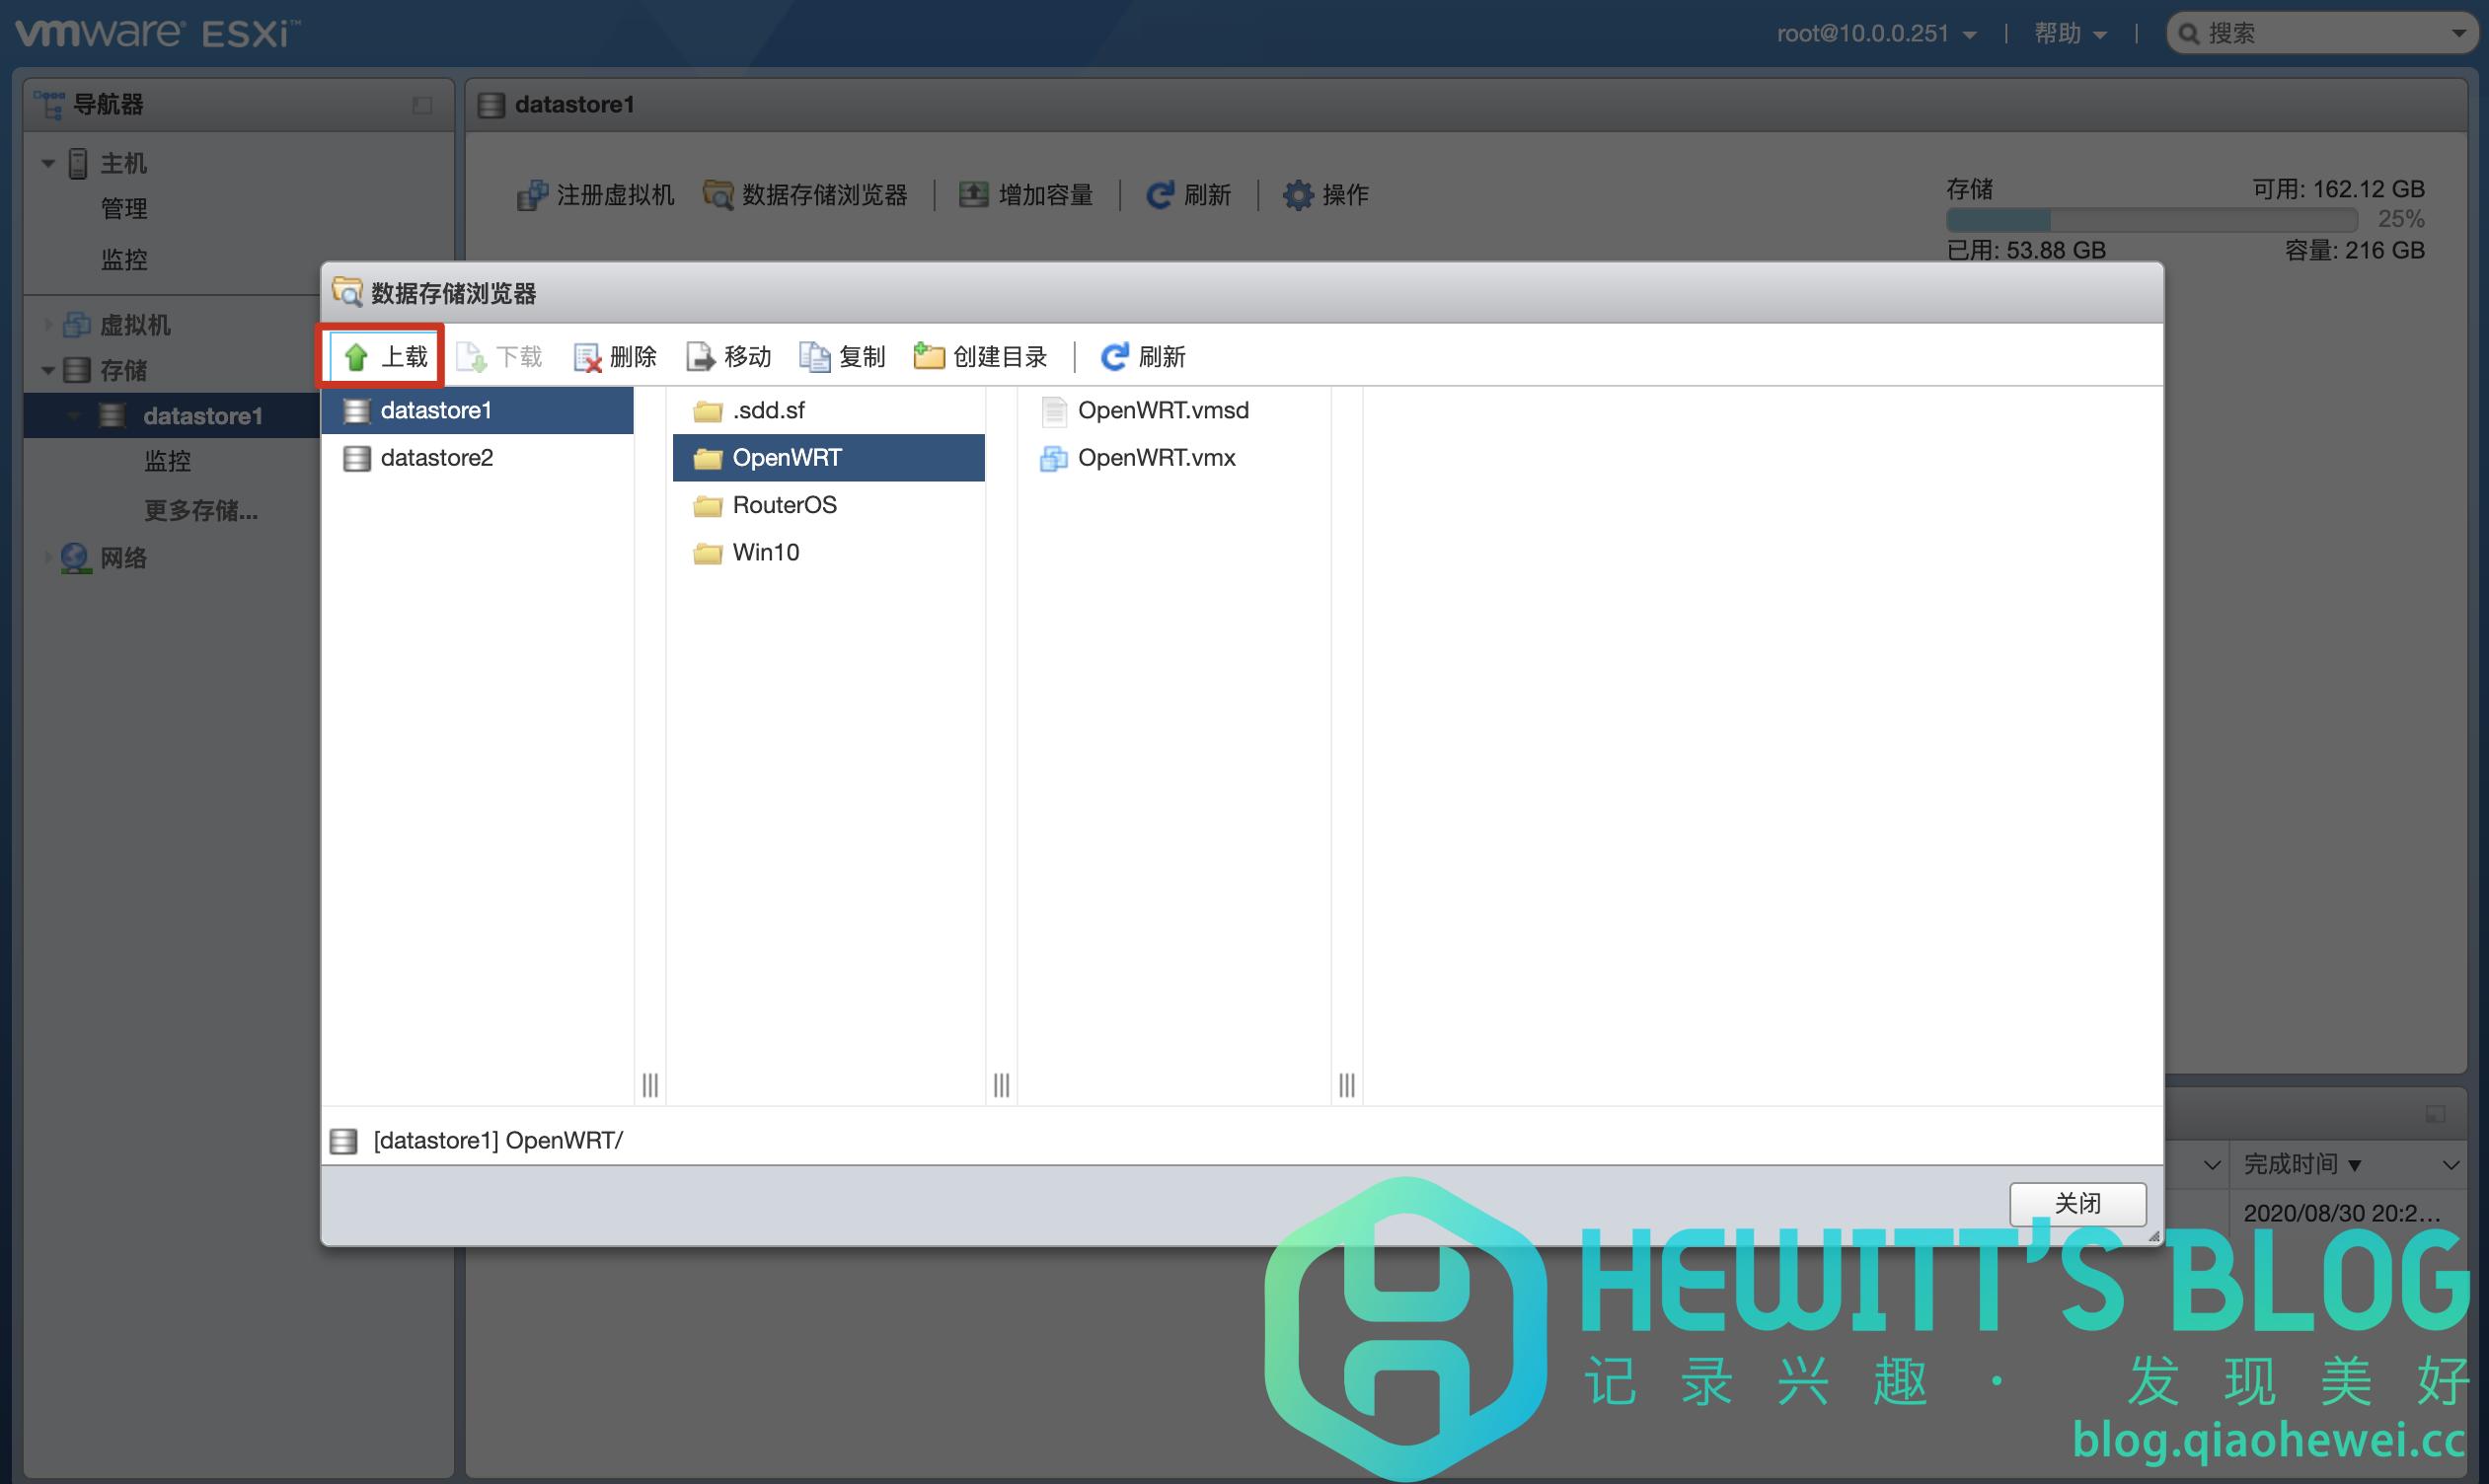 ESXI安装OpenWRT & LEDE软路由部署指南(附镜像下载)插图9